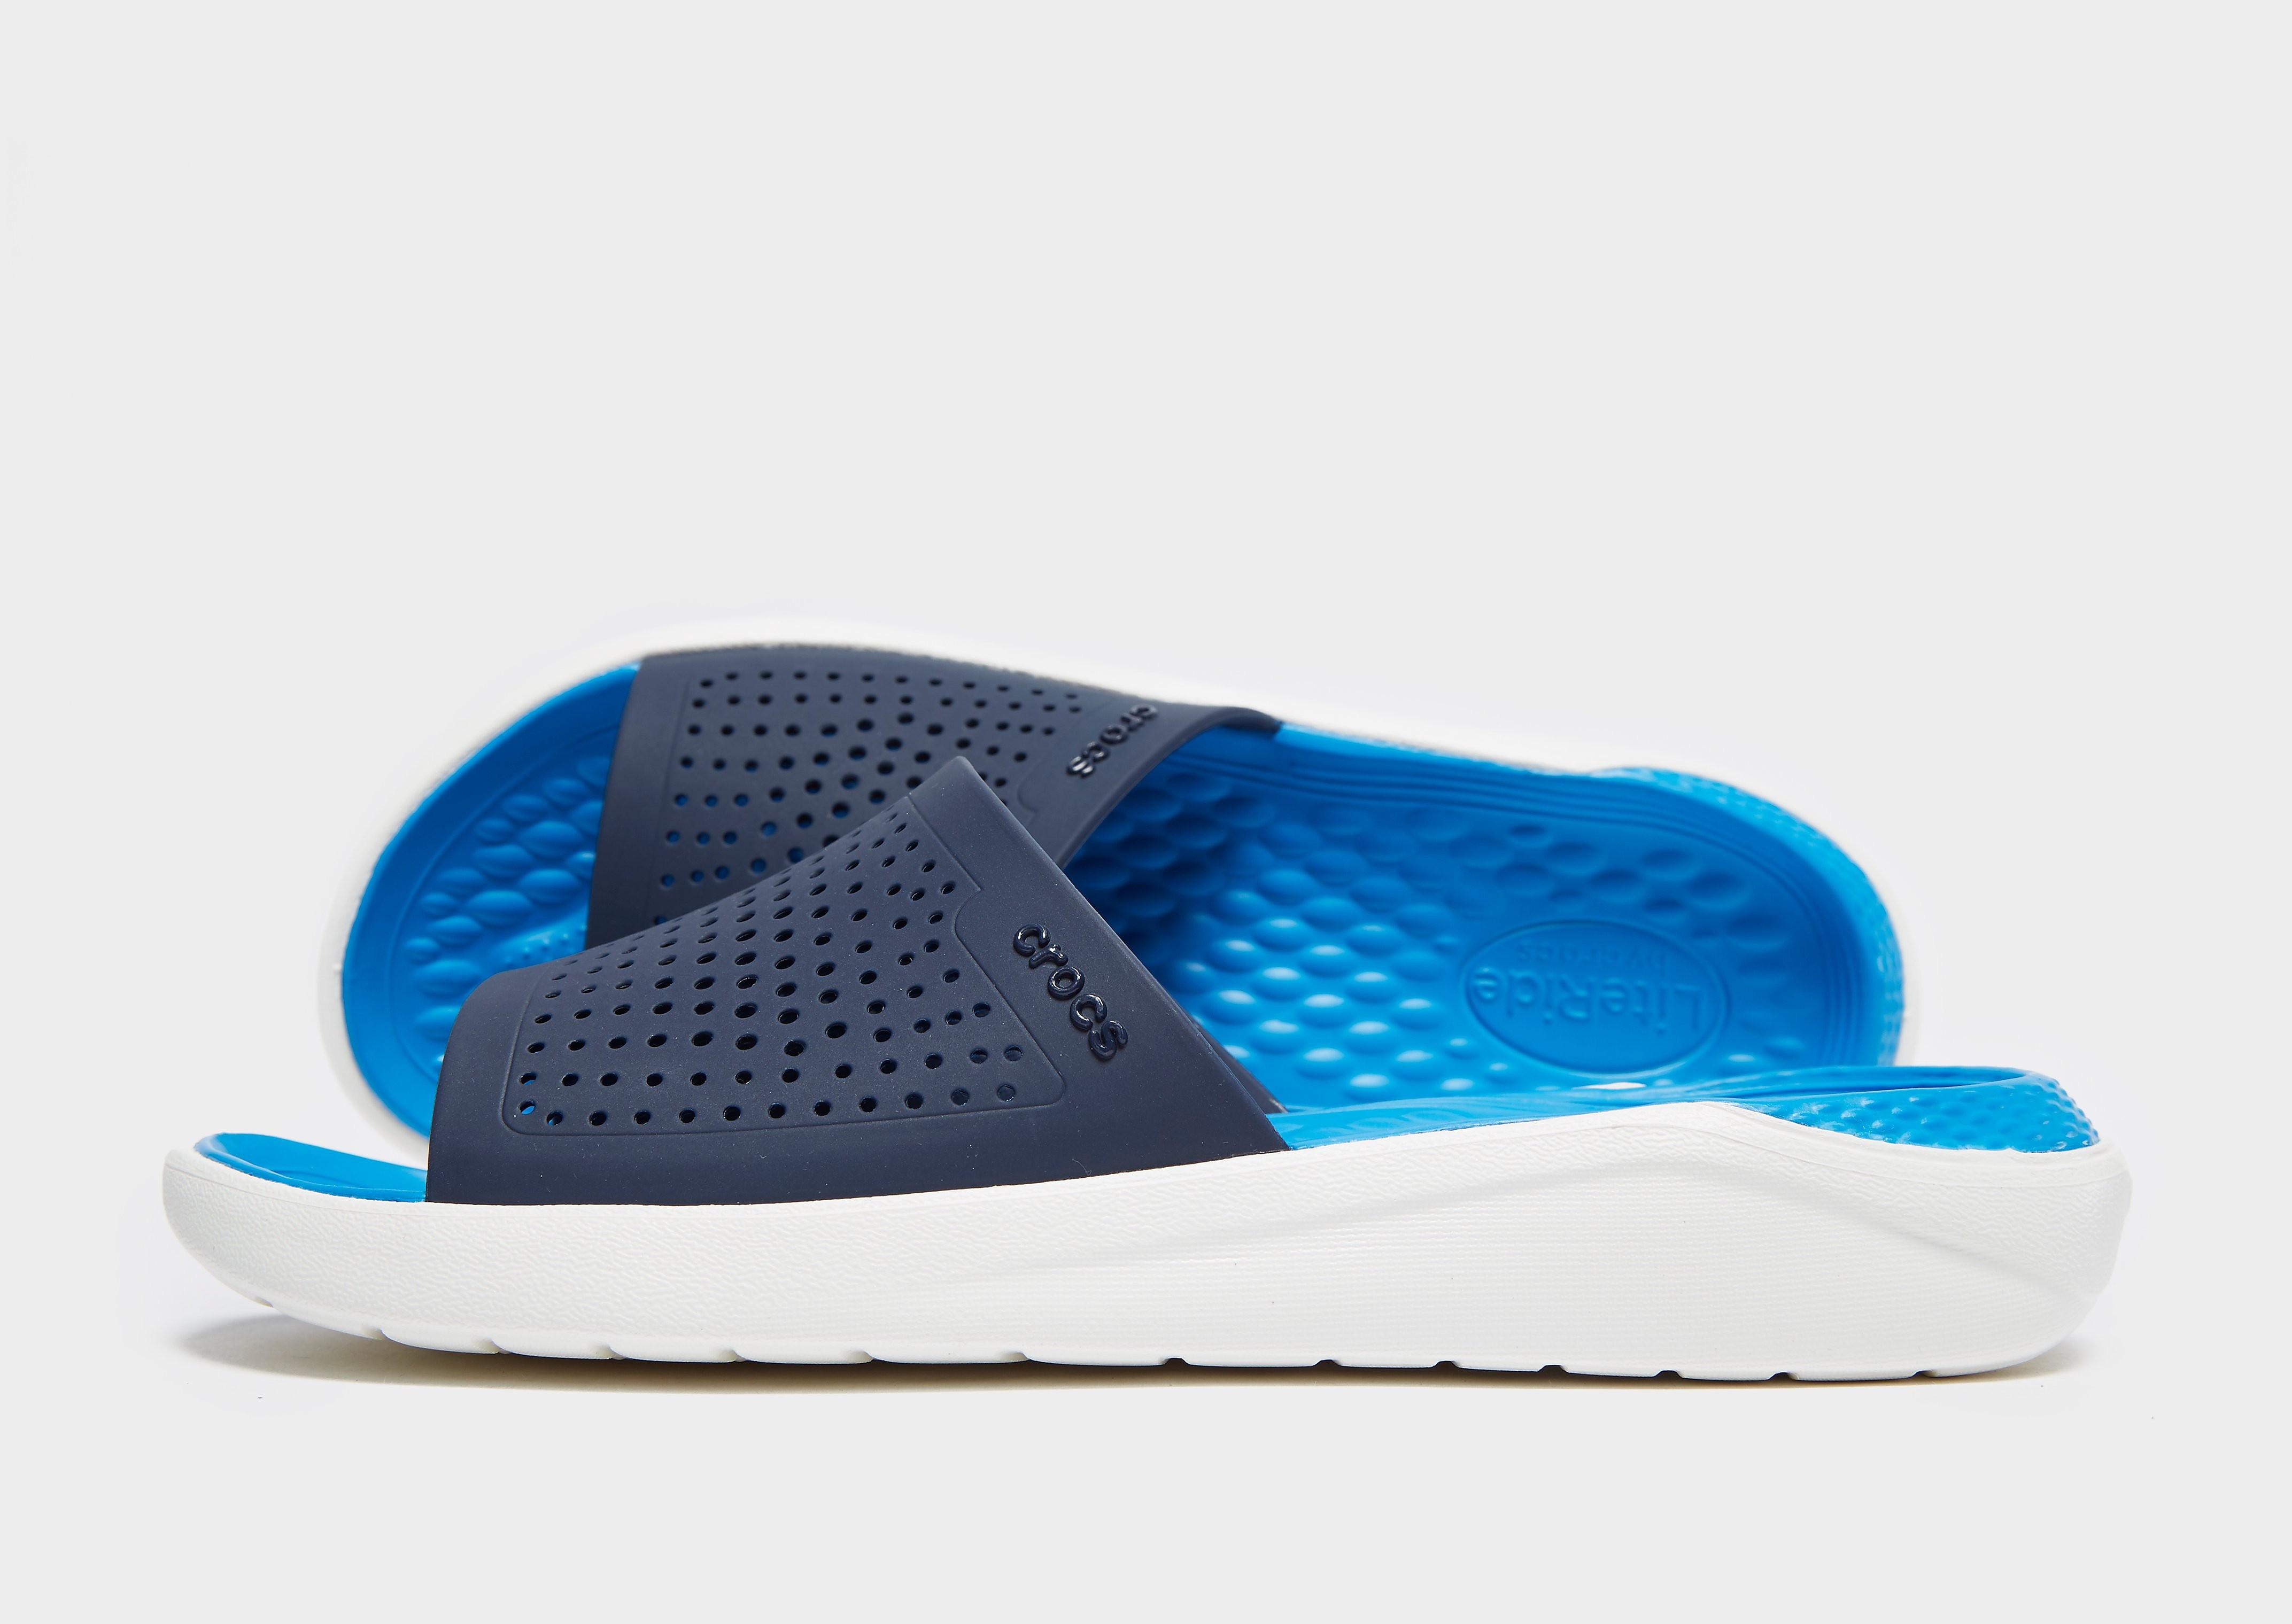 Crocs LightRide Slides Herren - Blau - Mens, Blau